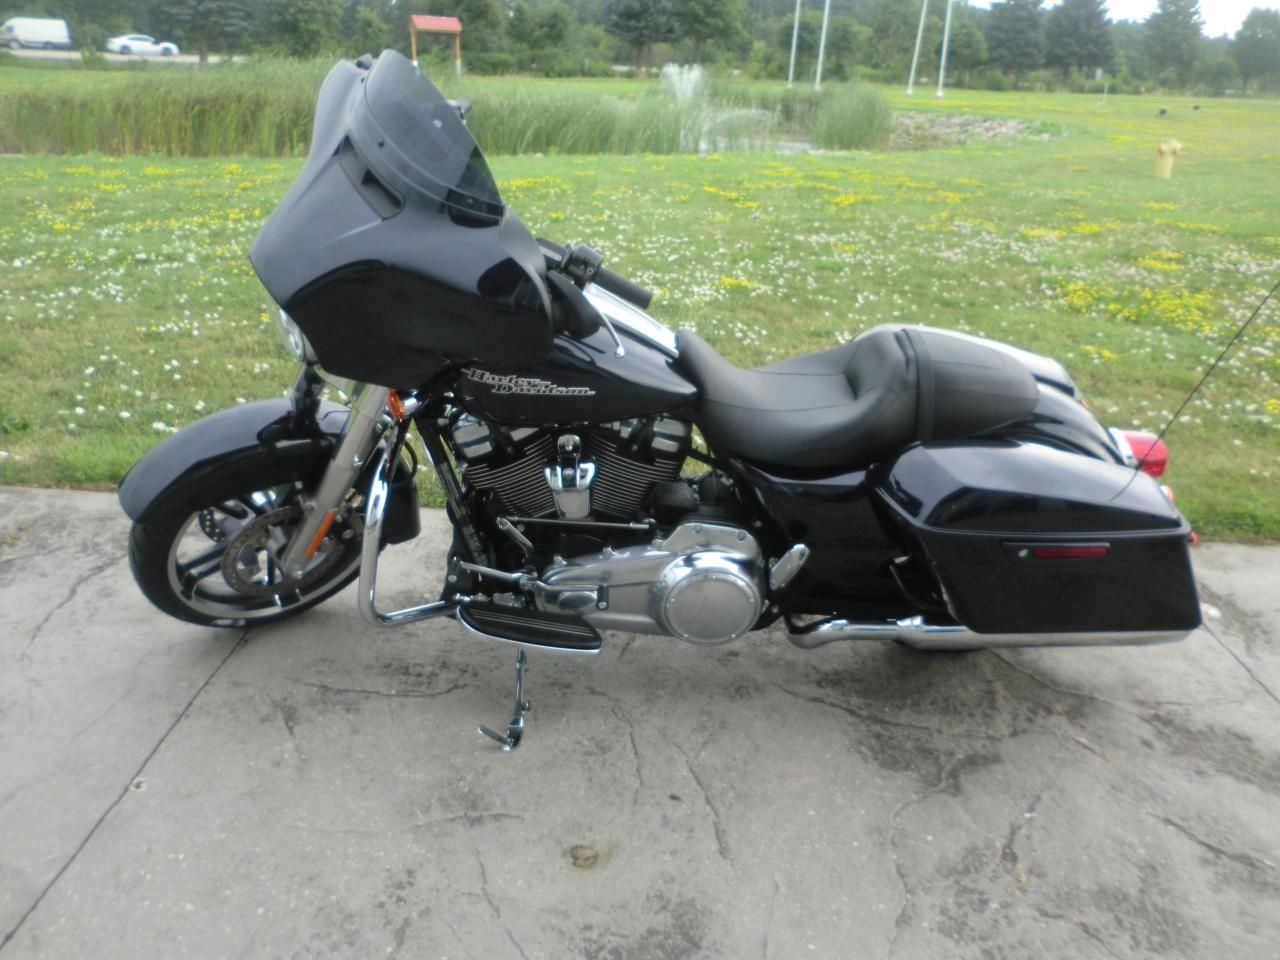 Used 2019 Harley Davidson Street Glide Flhx For Sale In